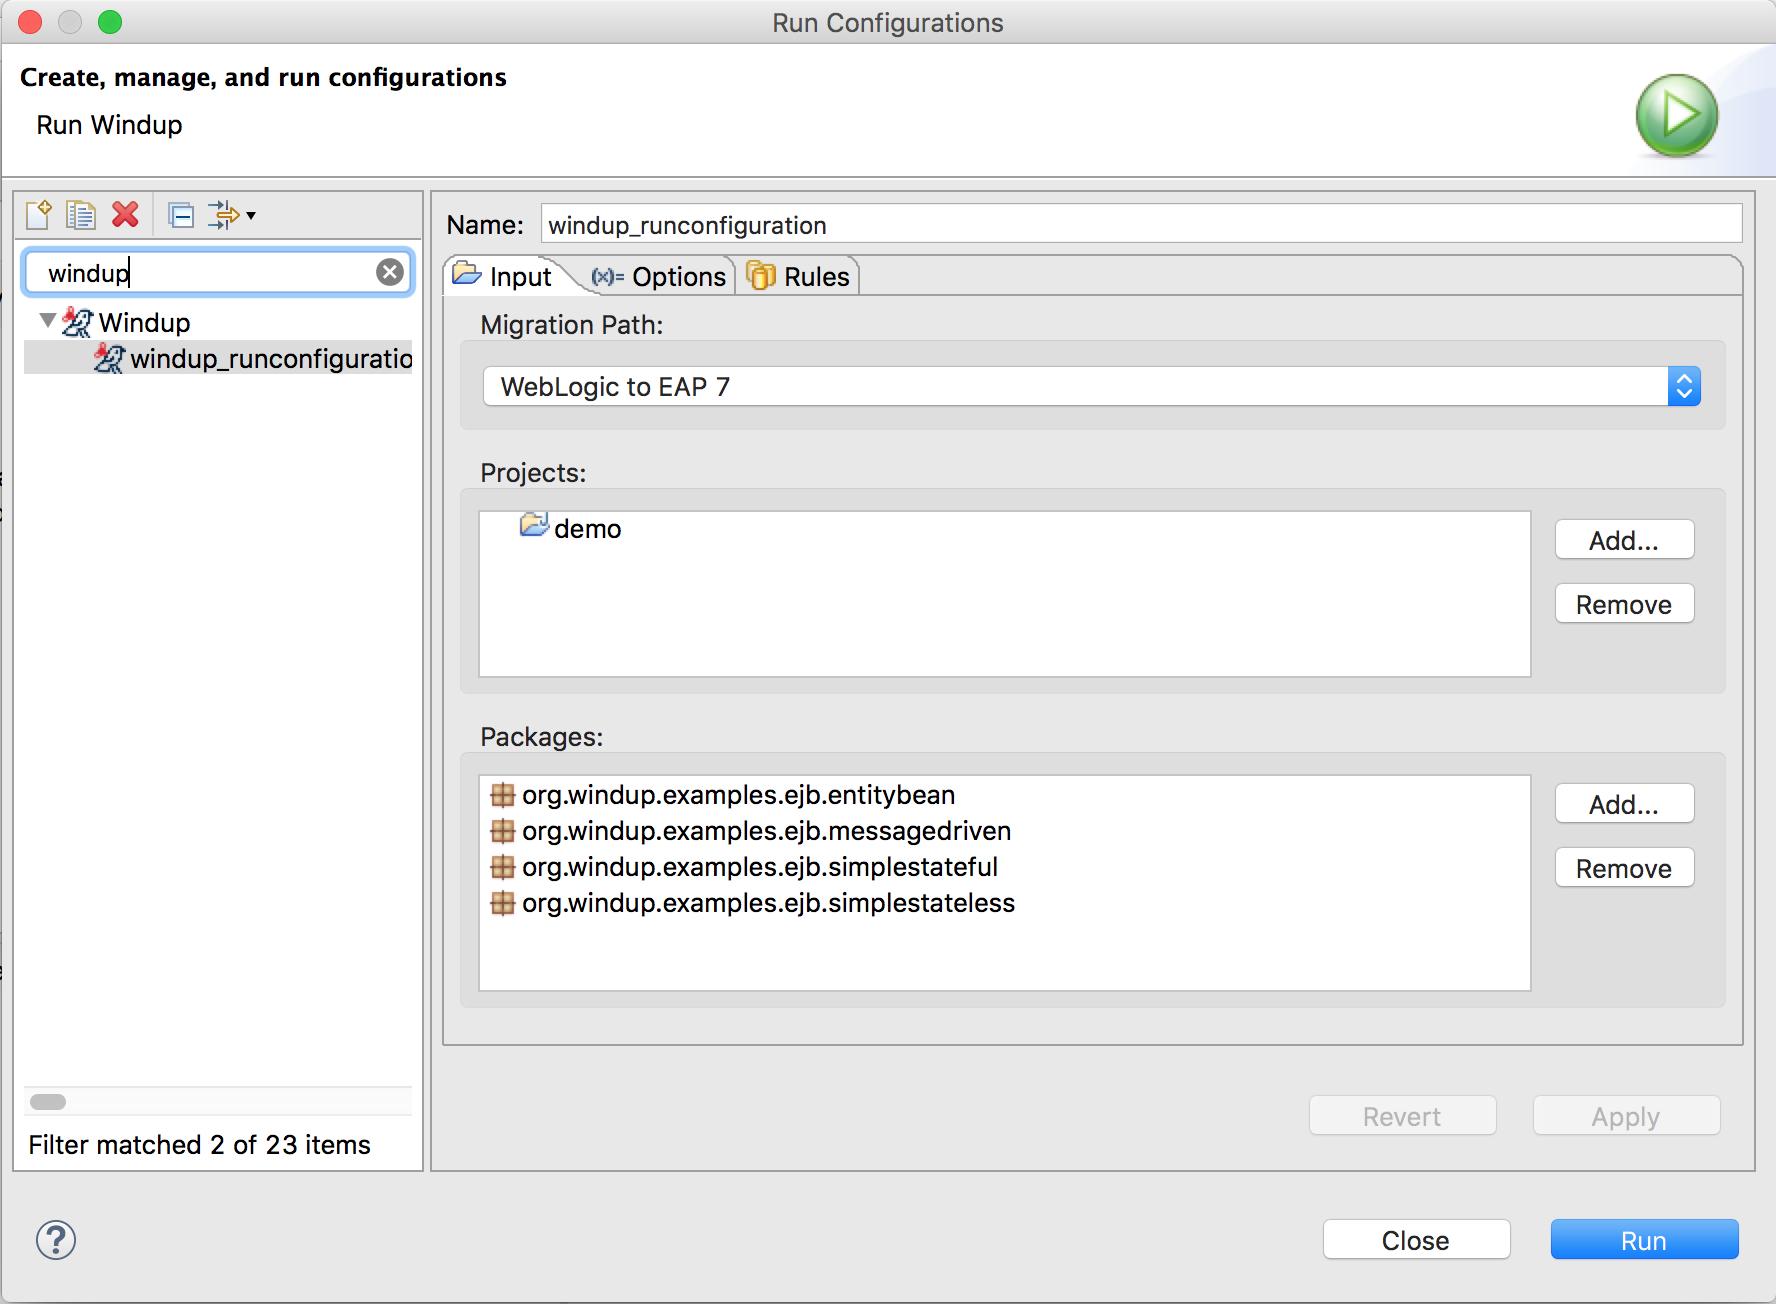 Run Configuration